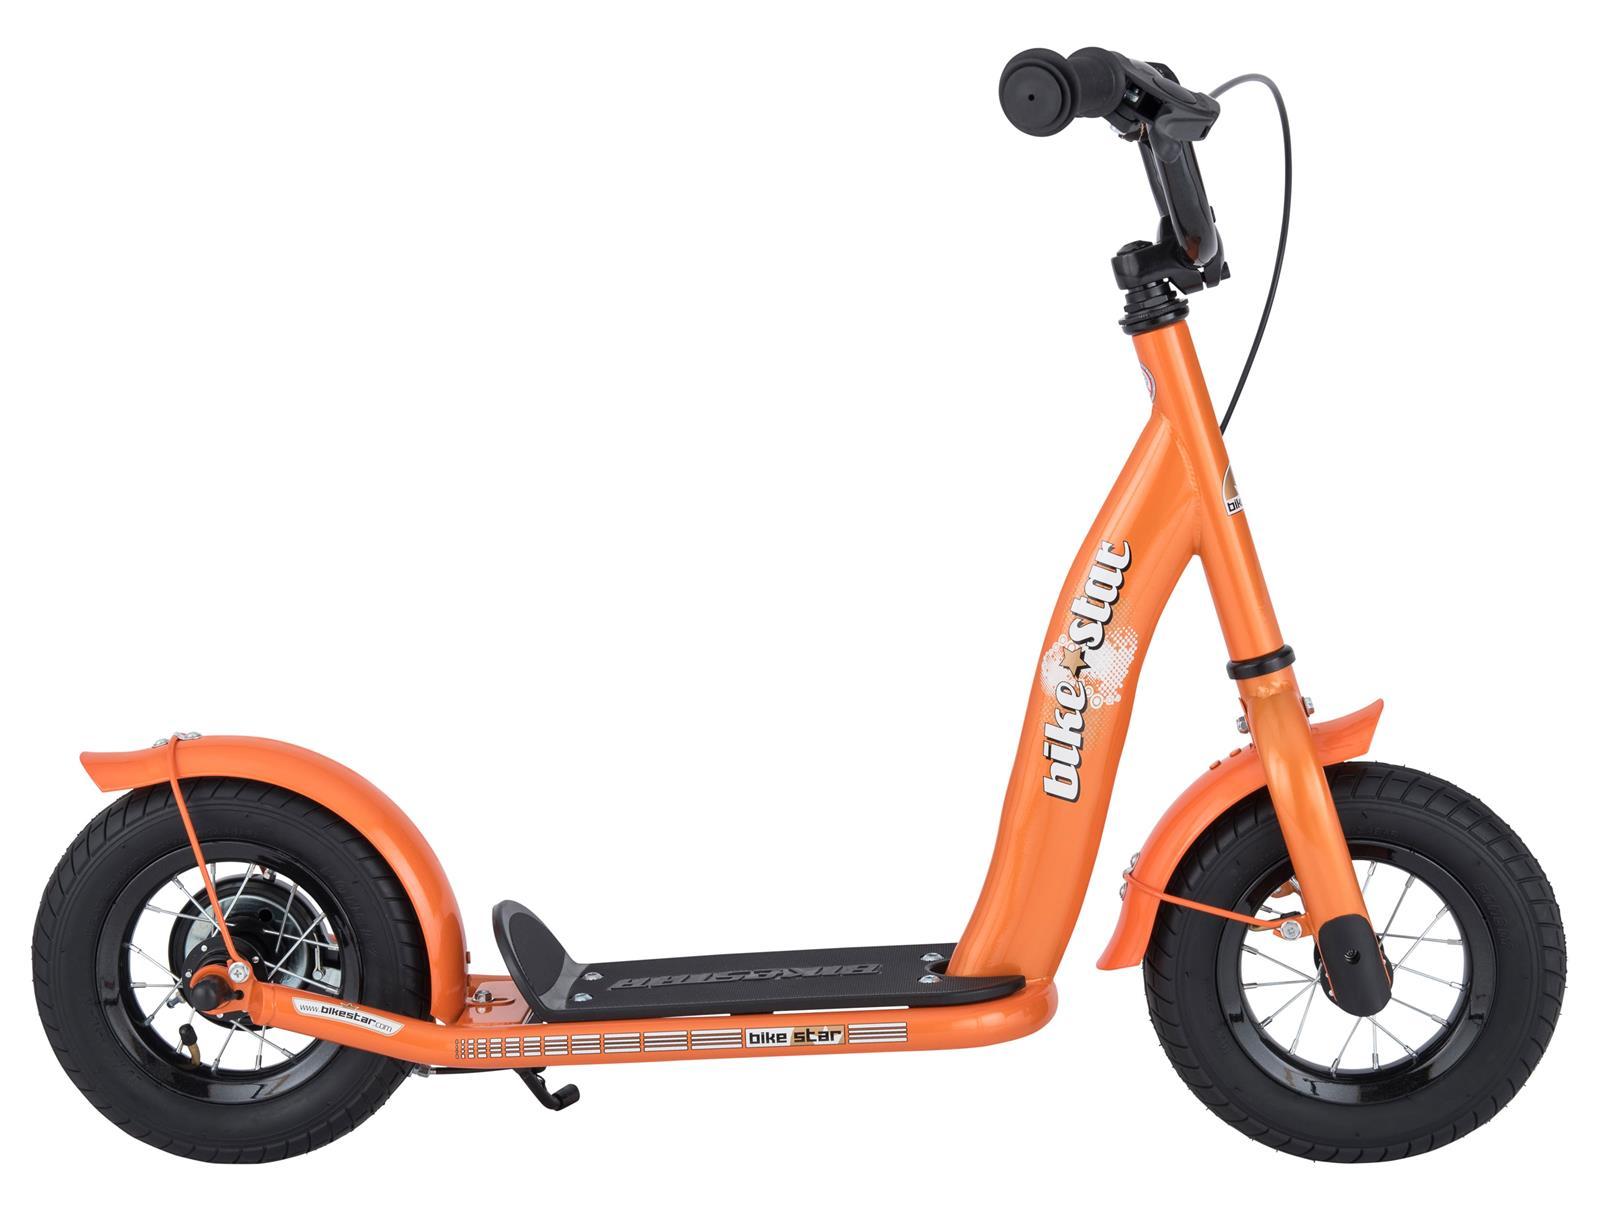 sc 10 kk 01 oran bikestar 10 zoll roller klassik orange. Black Bedroom Furniture Sets. Home Design Ideas